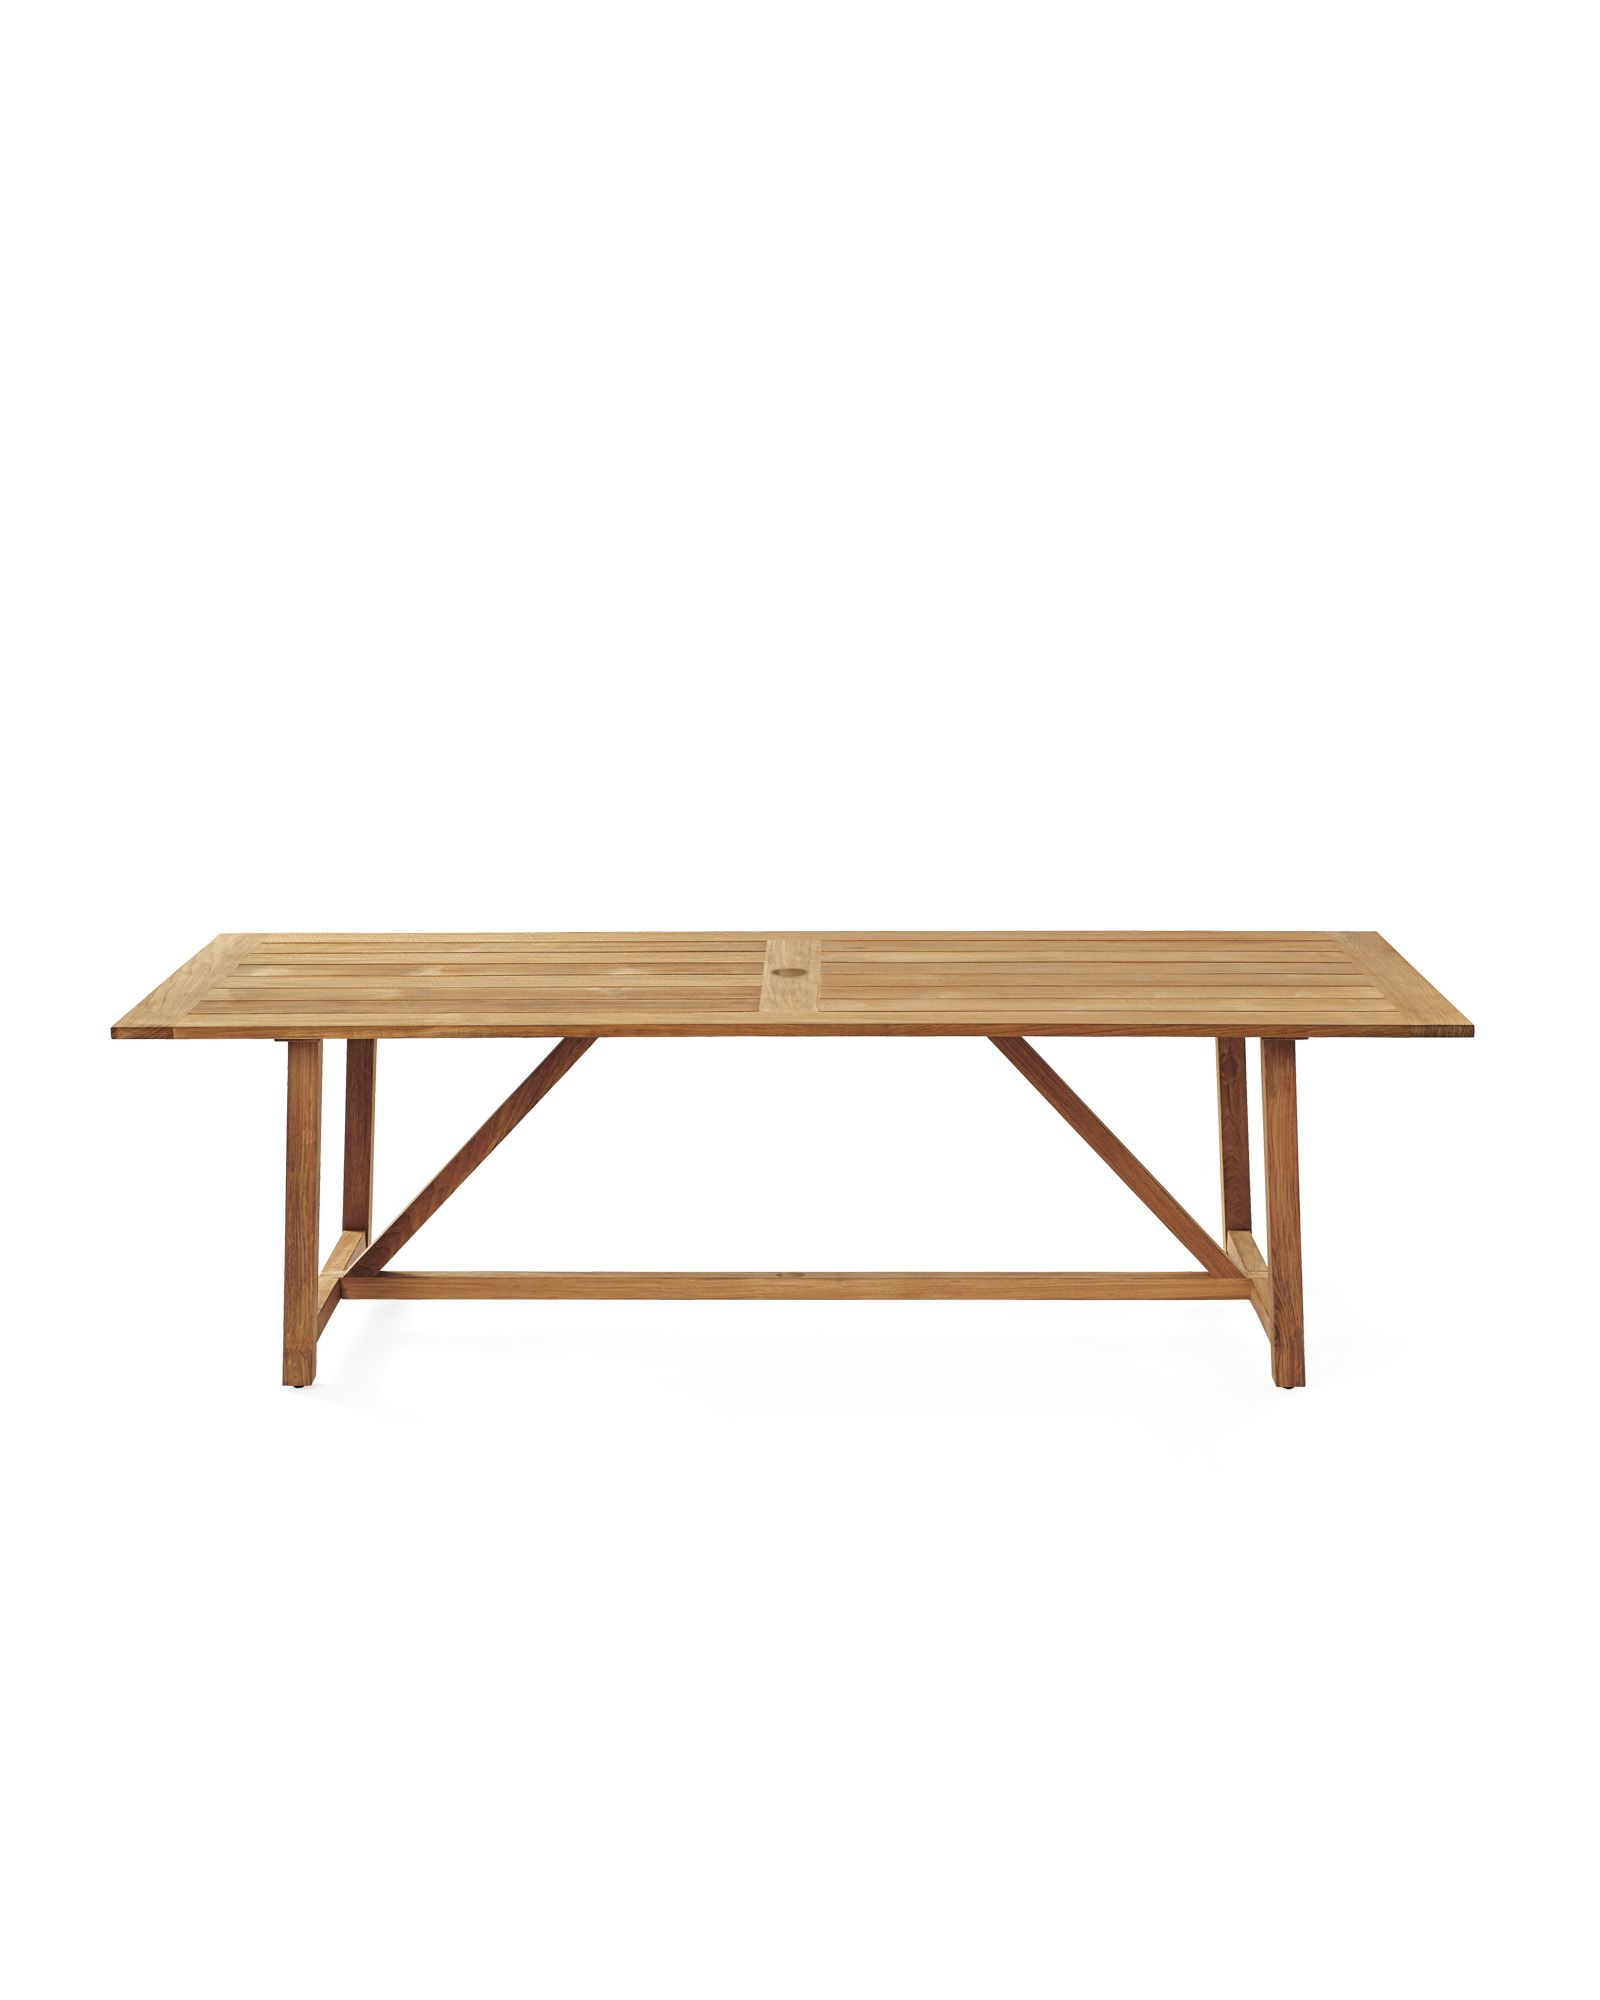 Crosby teak outdoor dining tablecrosby teak outdoor dining table